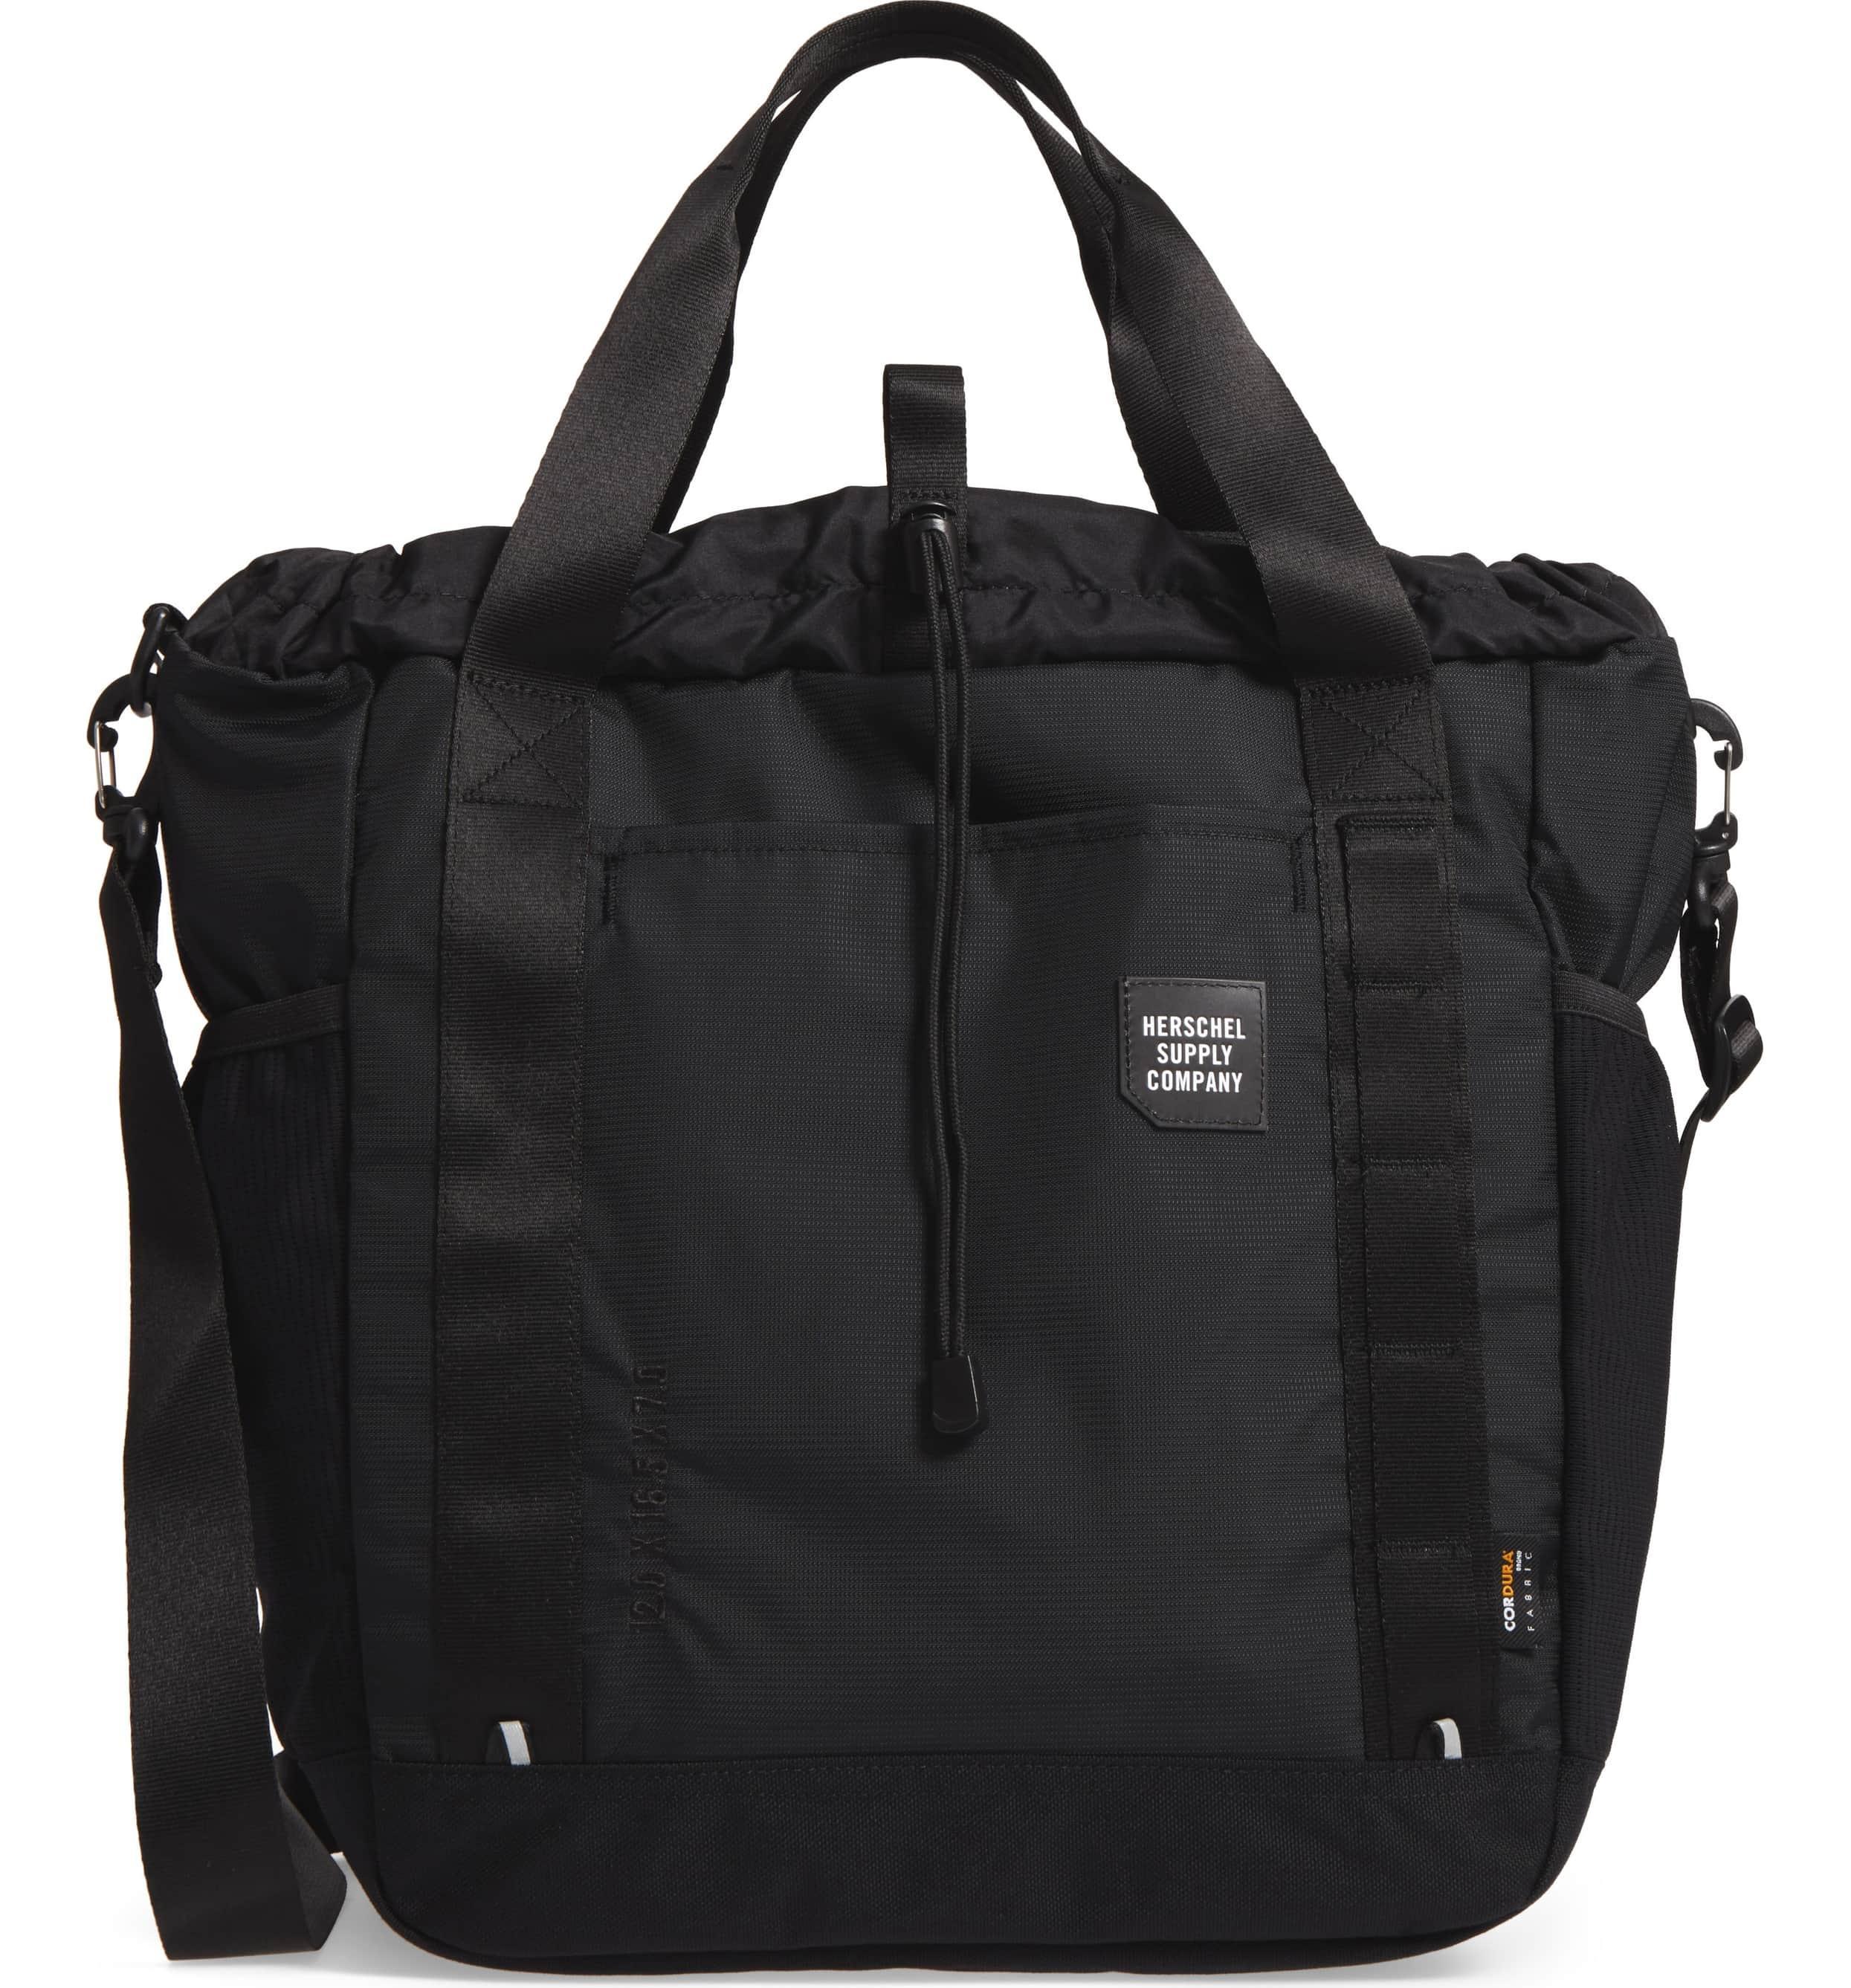 276b1400b3f  Herschel Supply Co.  Barnes 2 WAY 30L Tote Bag - Trail - Waterproof